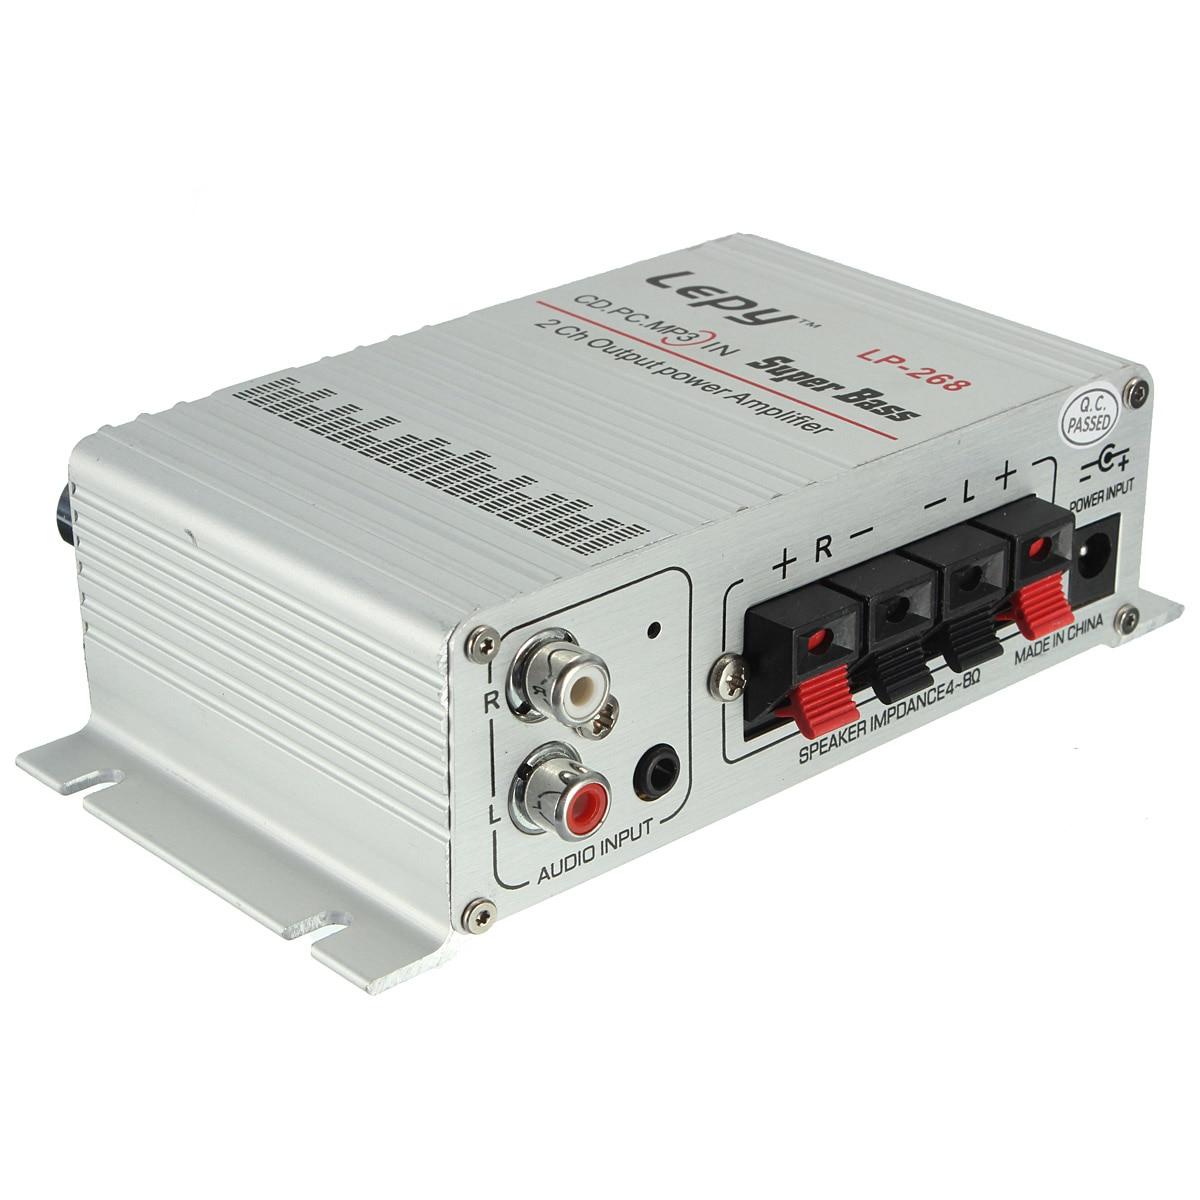 KROAK Auto Stereo Power Verstärker Hallo-fi 12 V Sound Modus Stereo Digital Auto Amp Radio Musik-Player Unterstützung MP3 CD aluminium